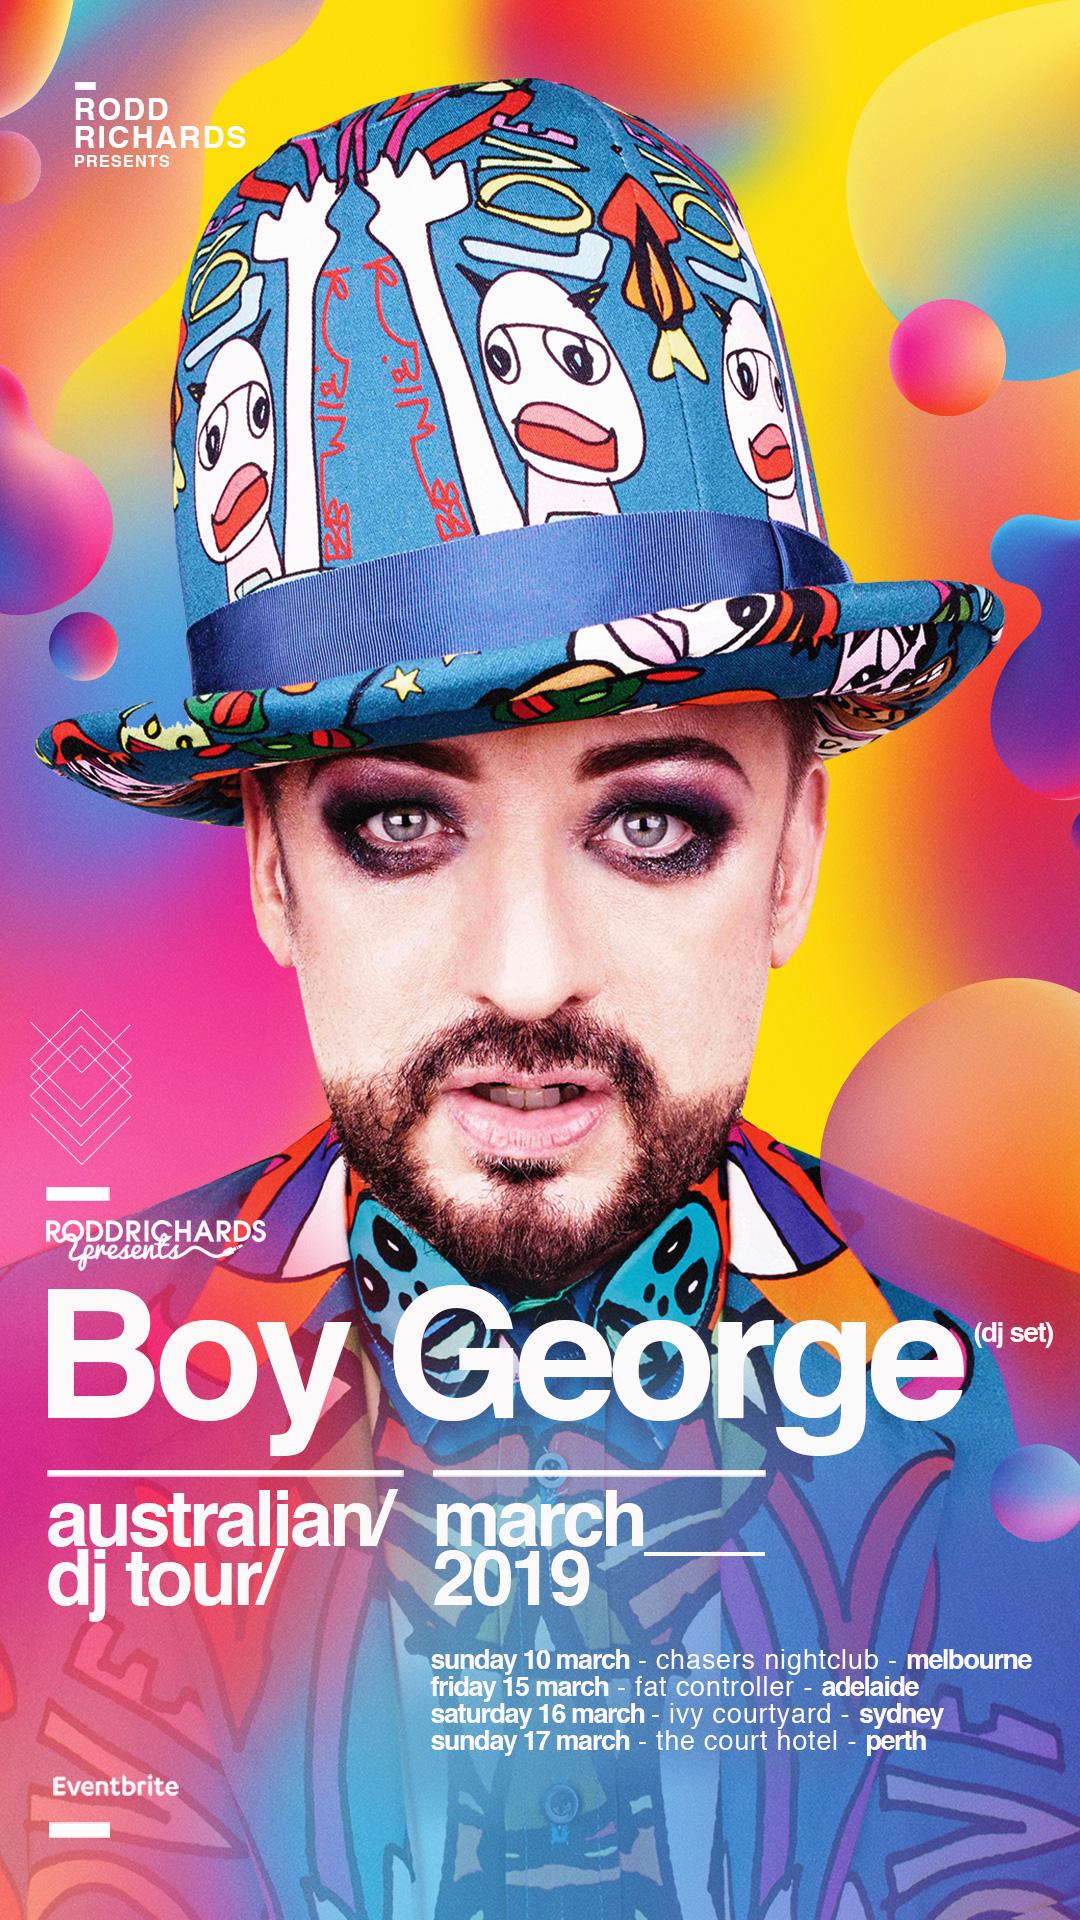 Boy George Tour Dates.jpeg